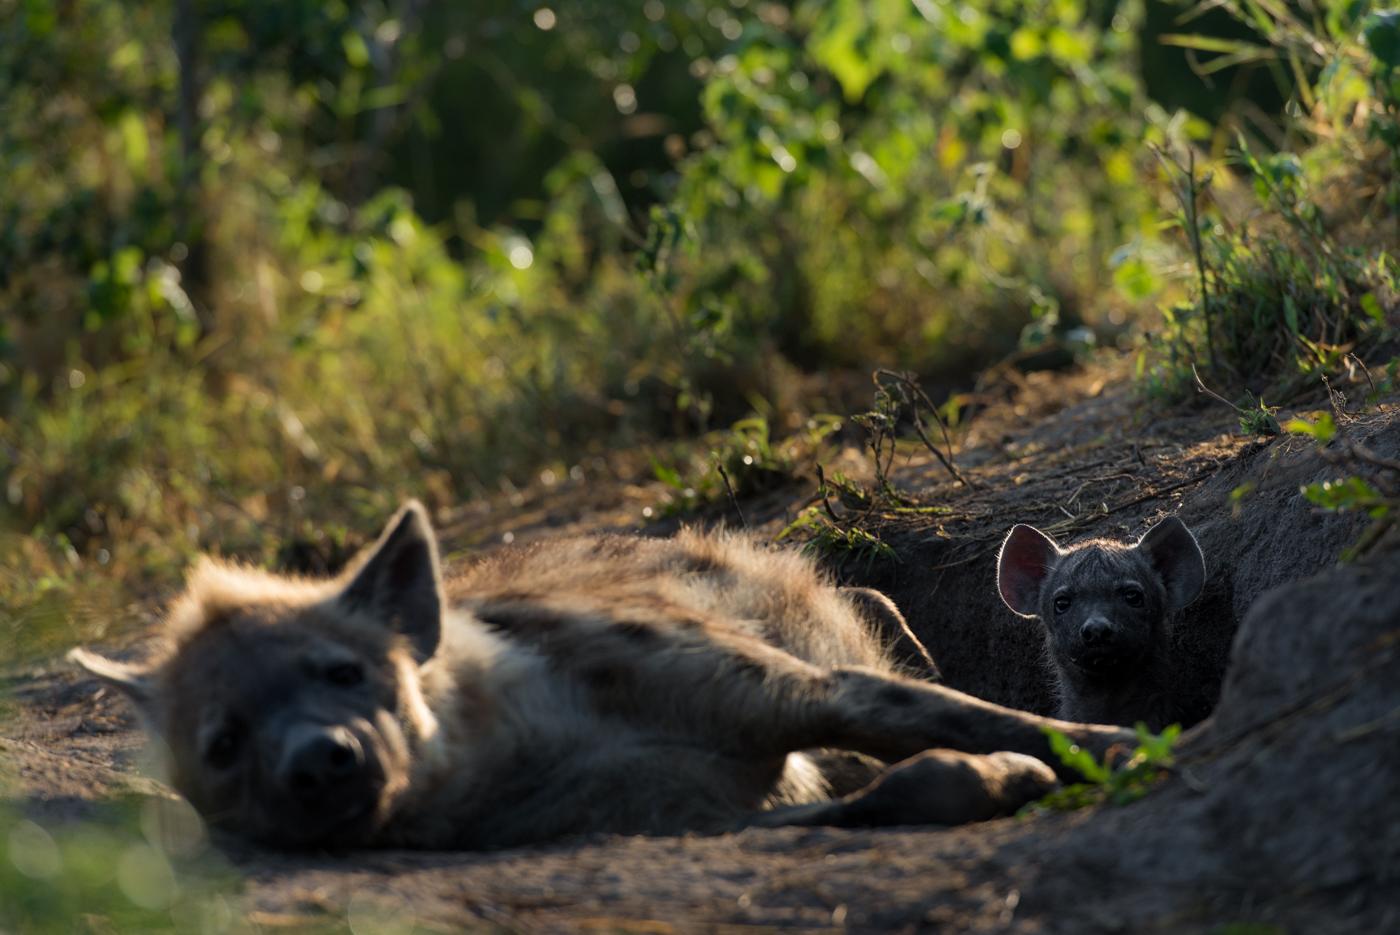 hyena cub, SC